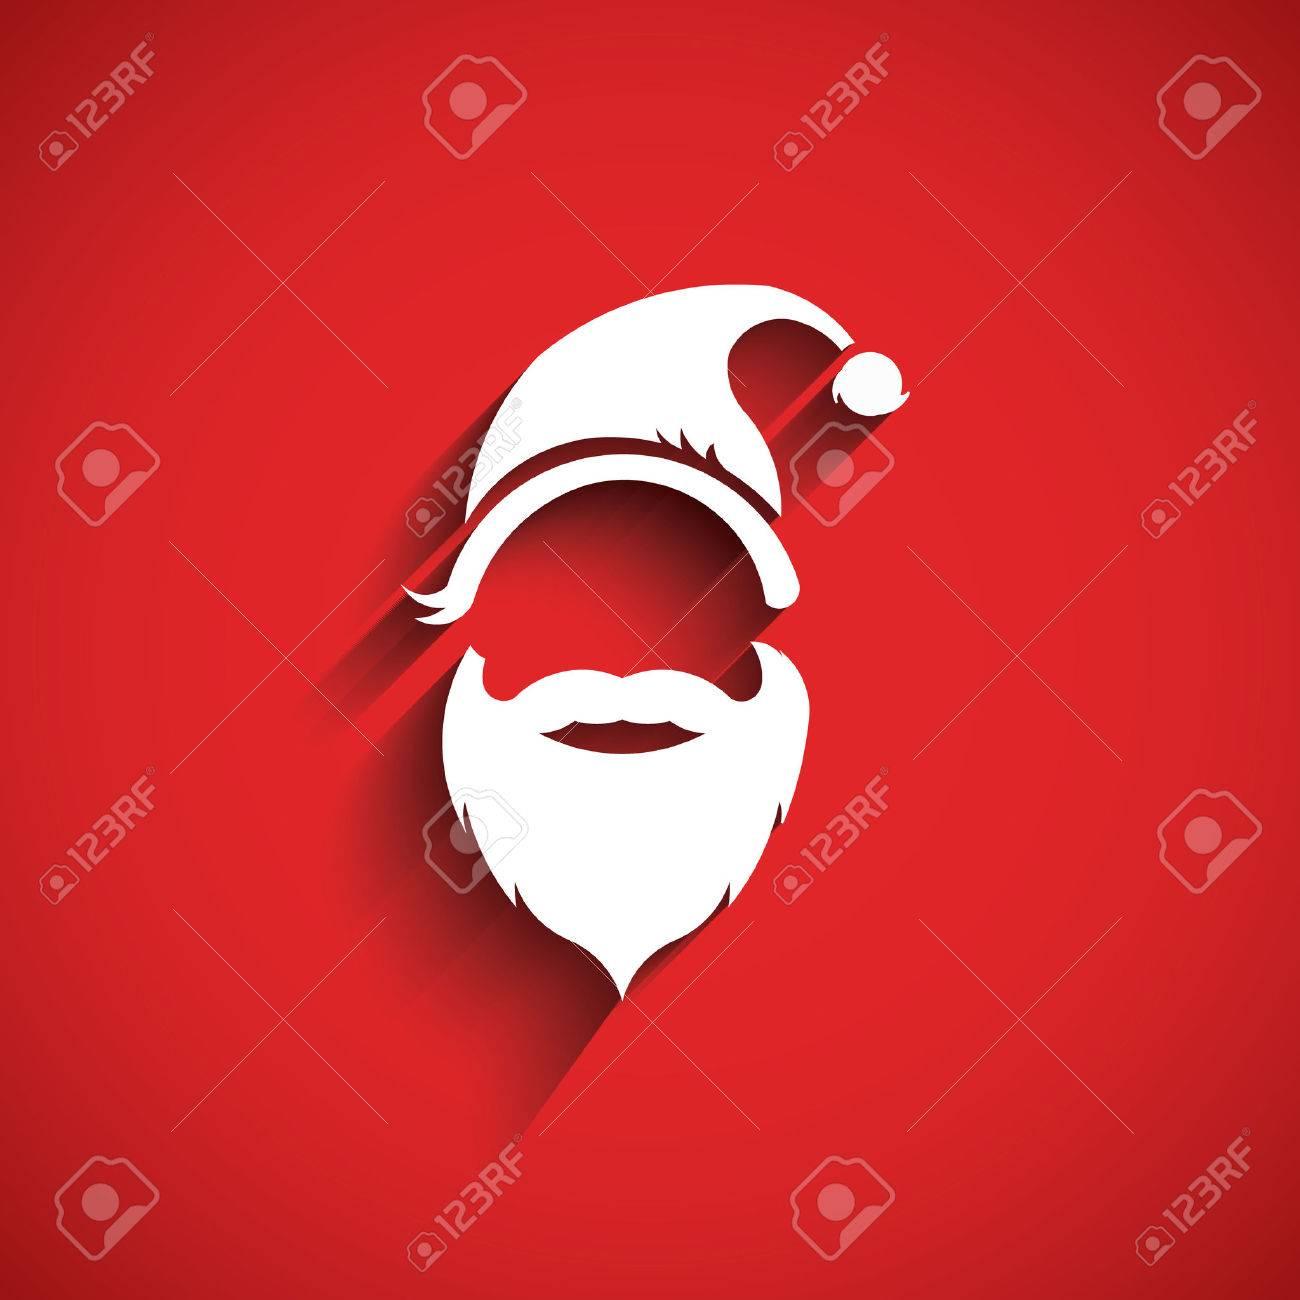 Santa hat, moustache with beard.3D Paper style Archivio Fotografico - 48162027